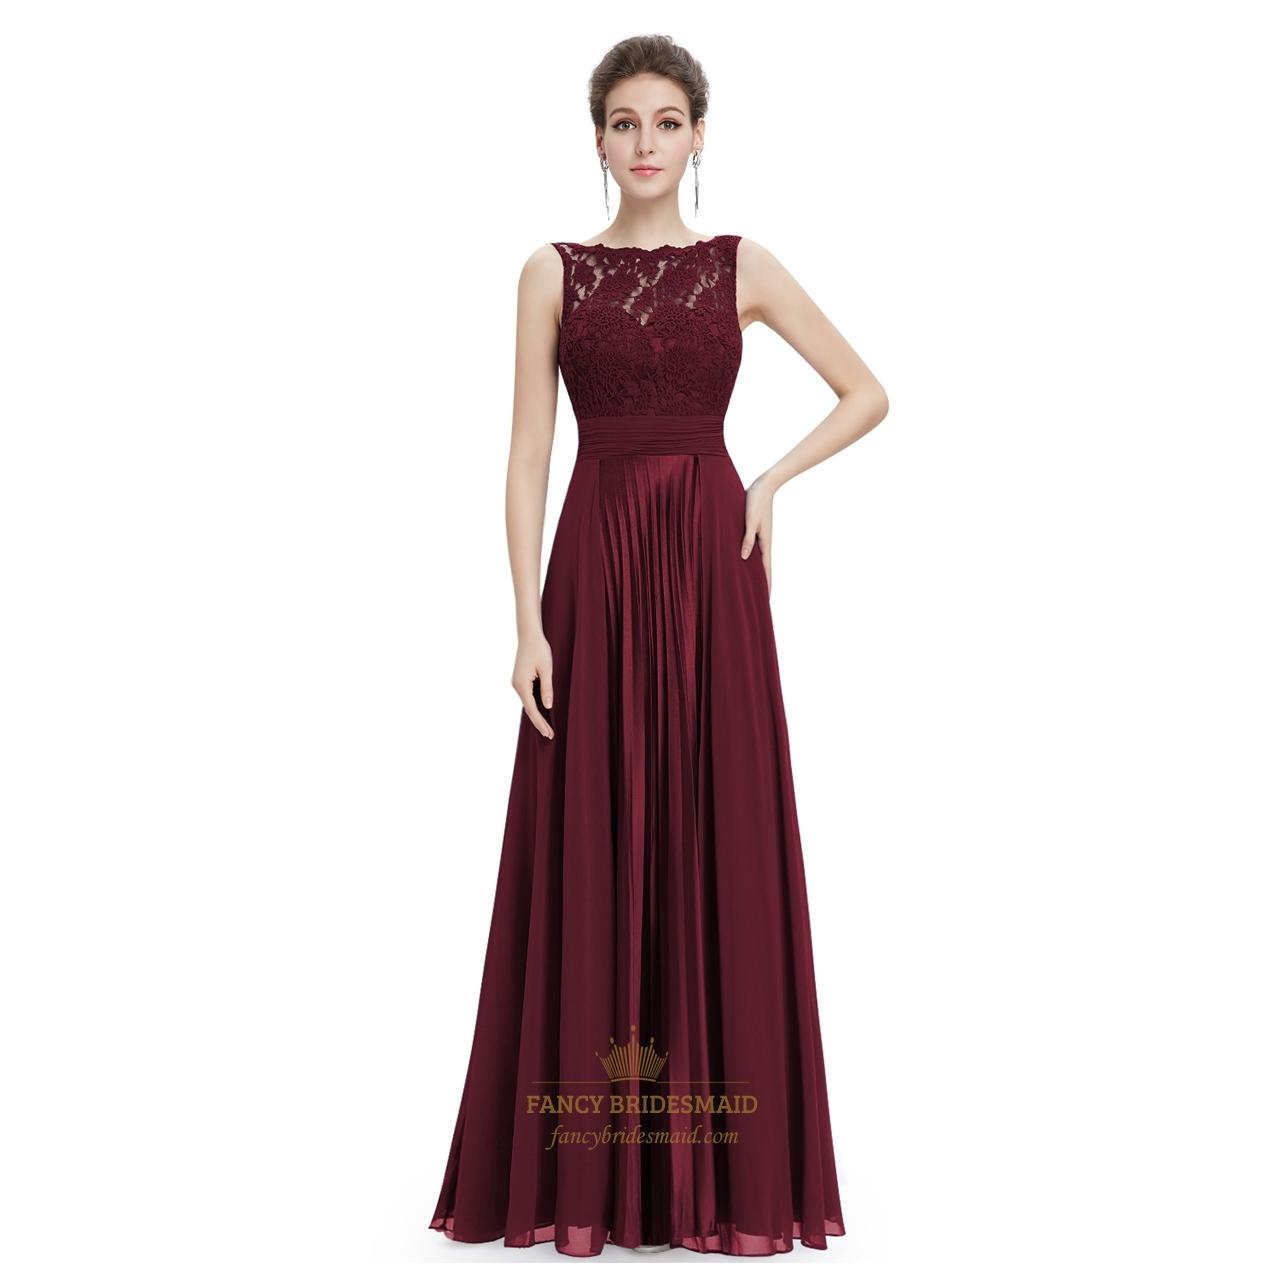 Burgundy Chiffon Sheer Illusion Neckline Lace Bodice Dress With Ruching | Fancy Bridesmaid Dresses